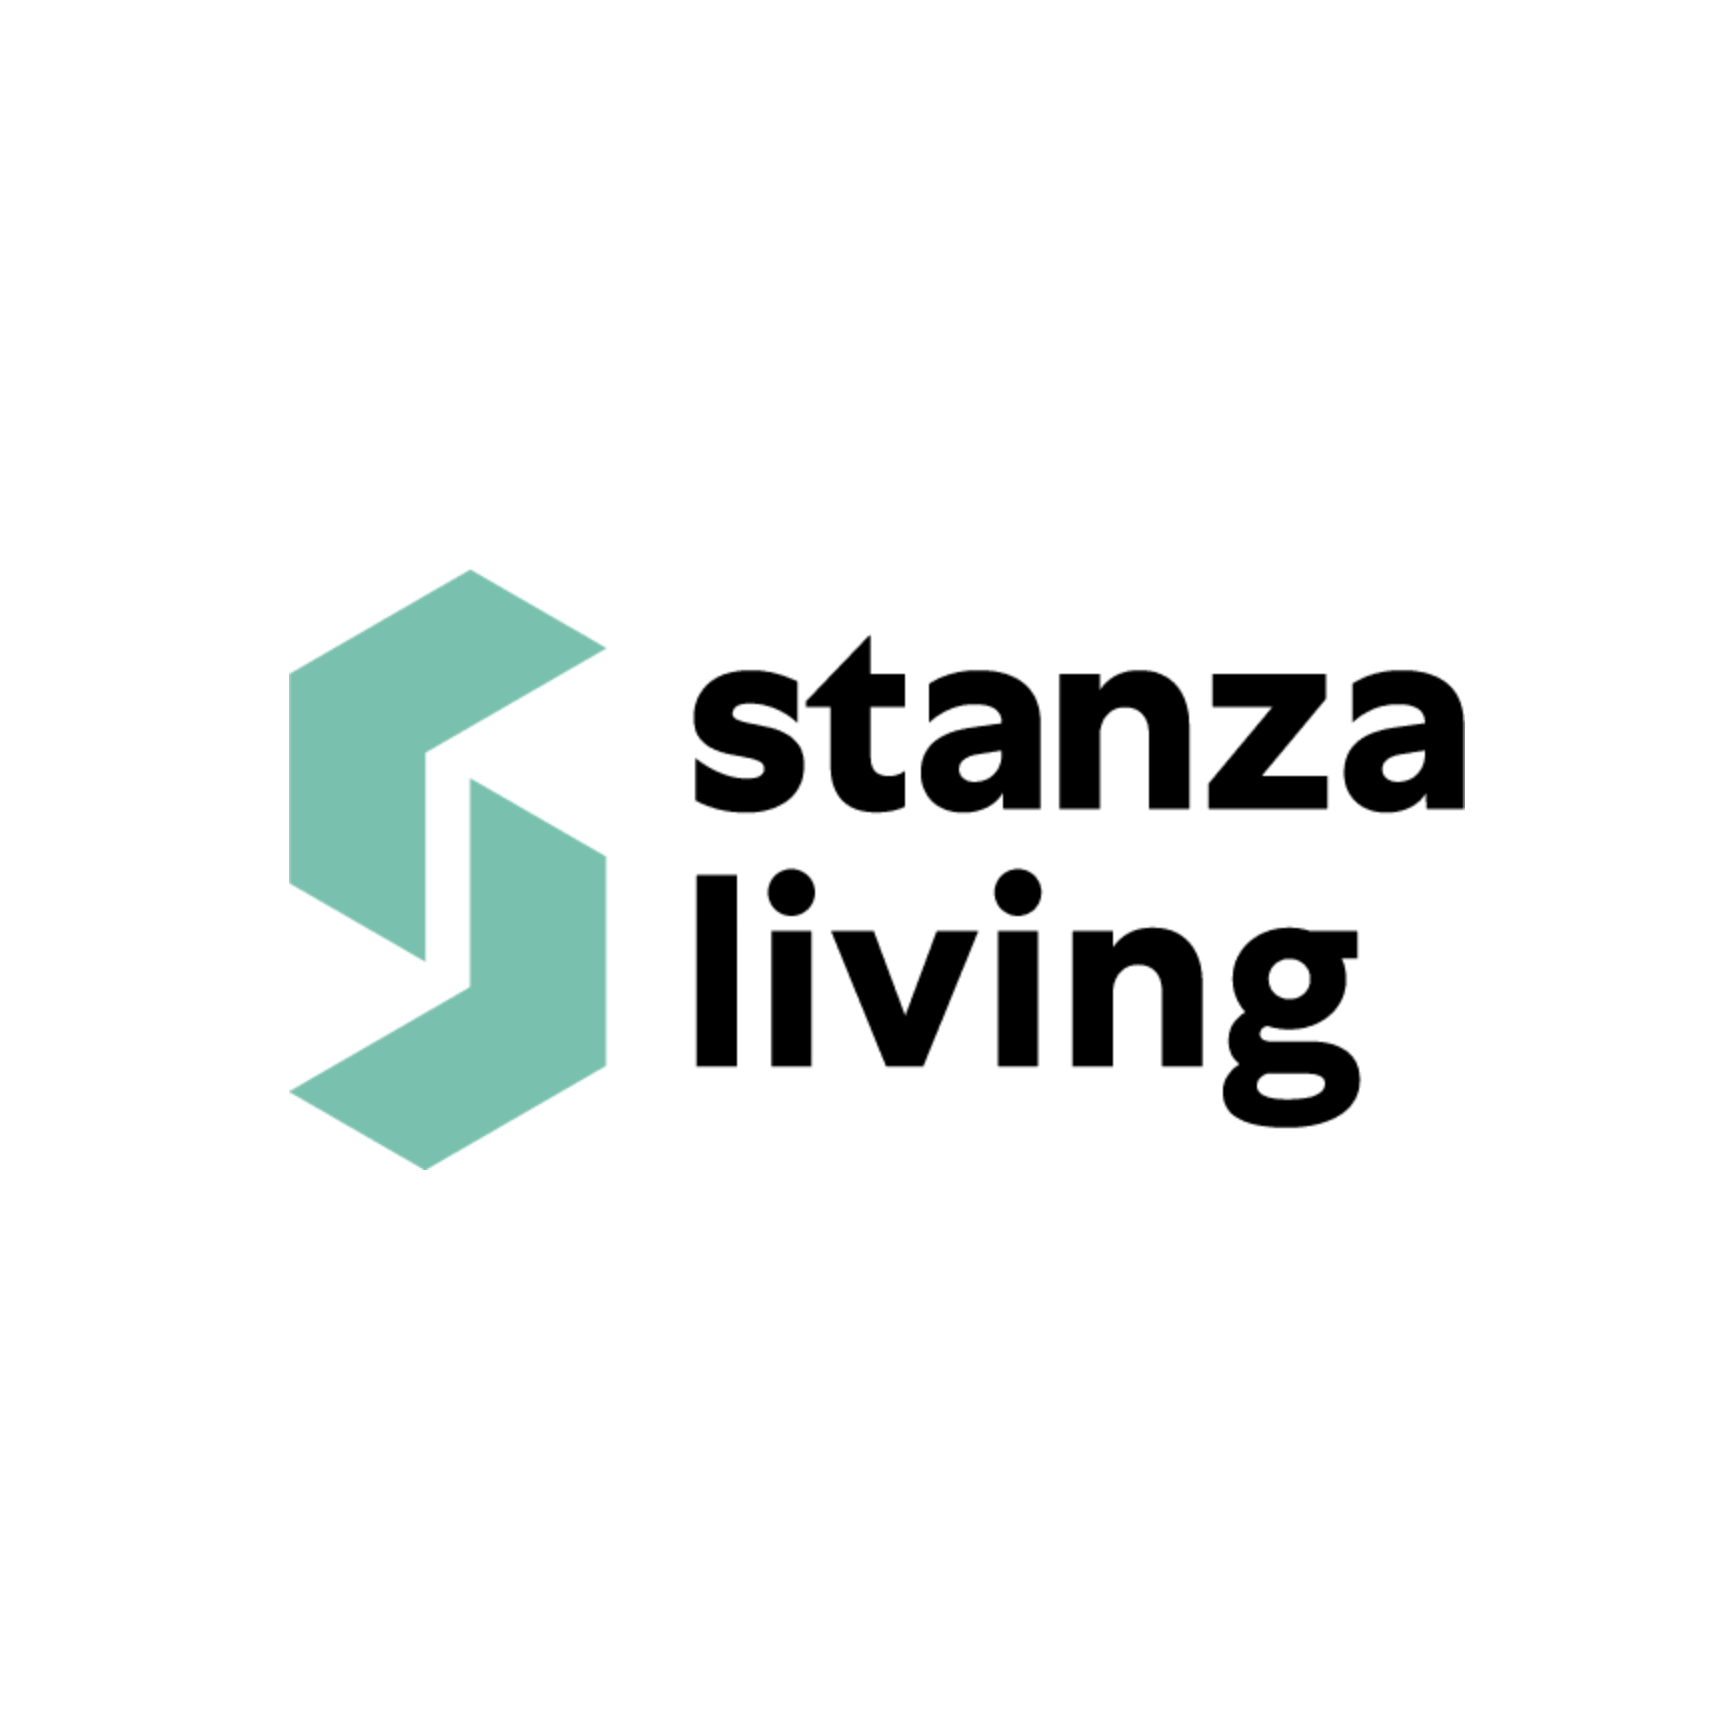 Stanza Living Coliving Company